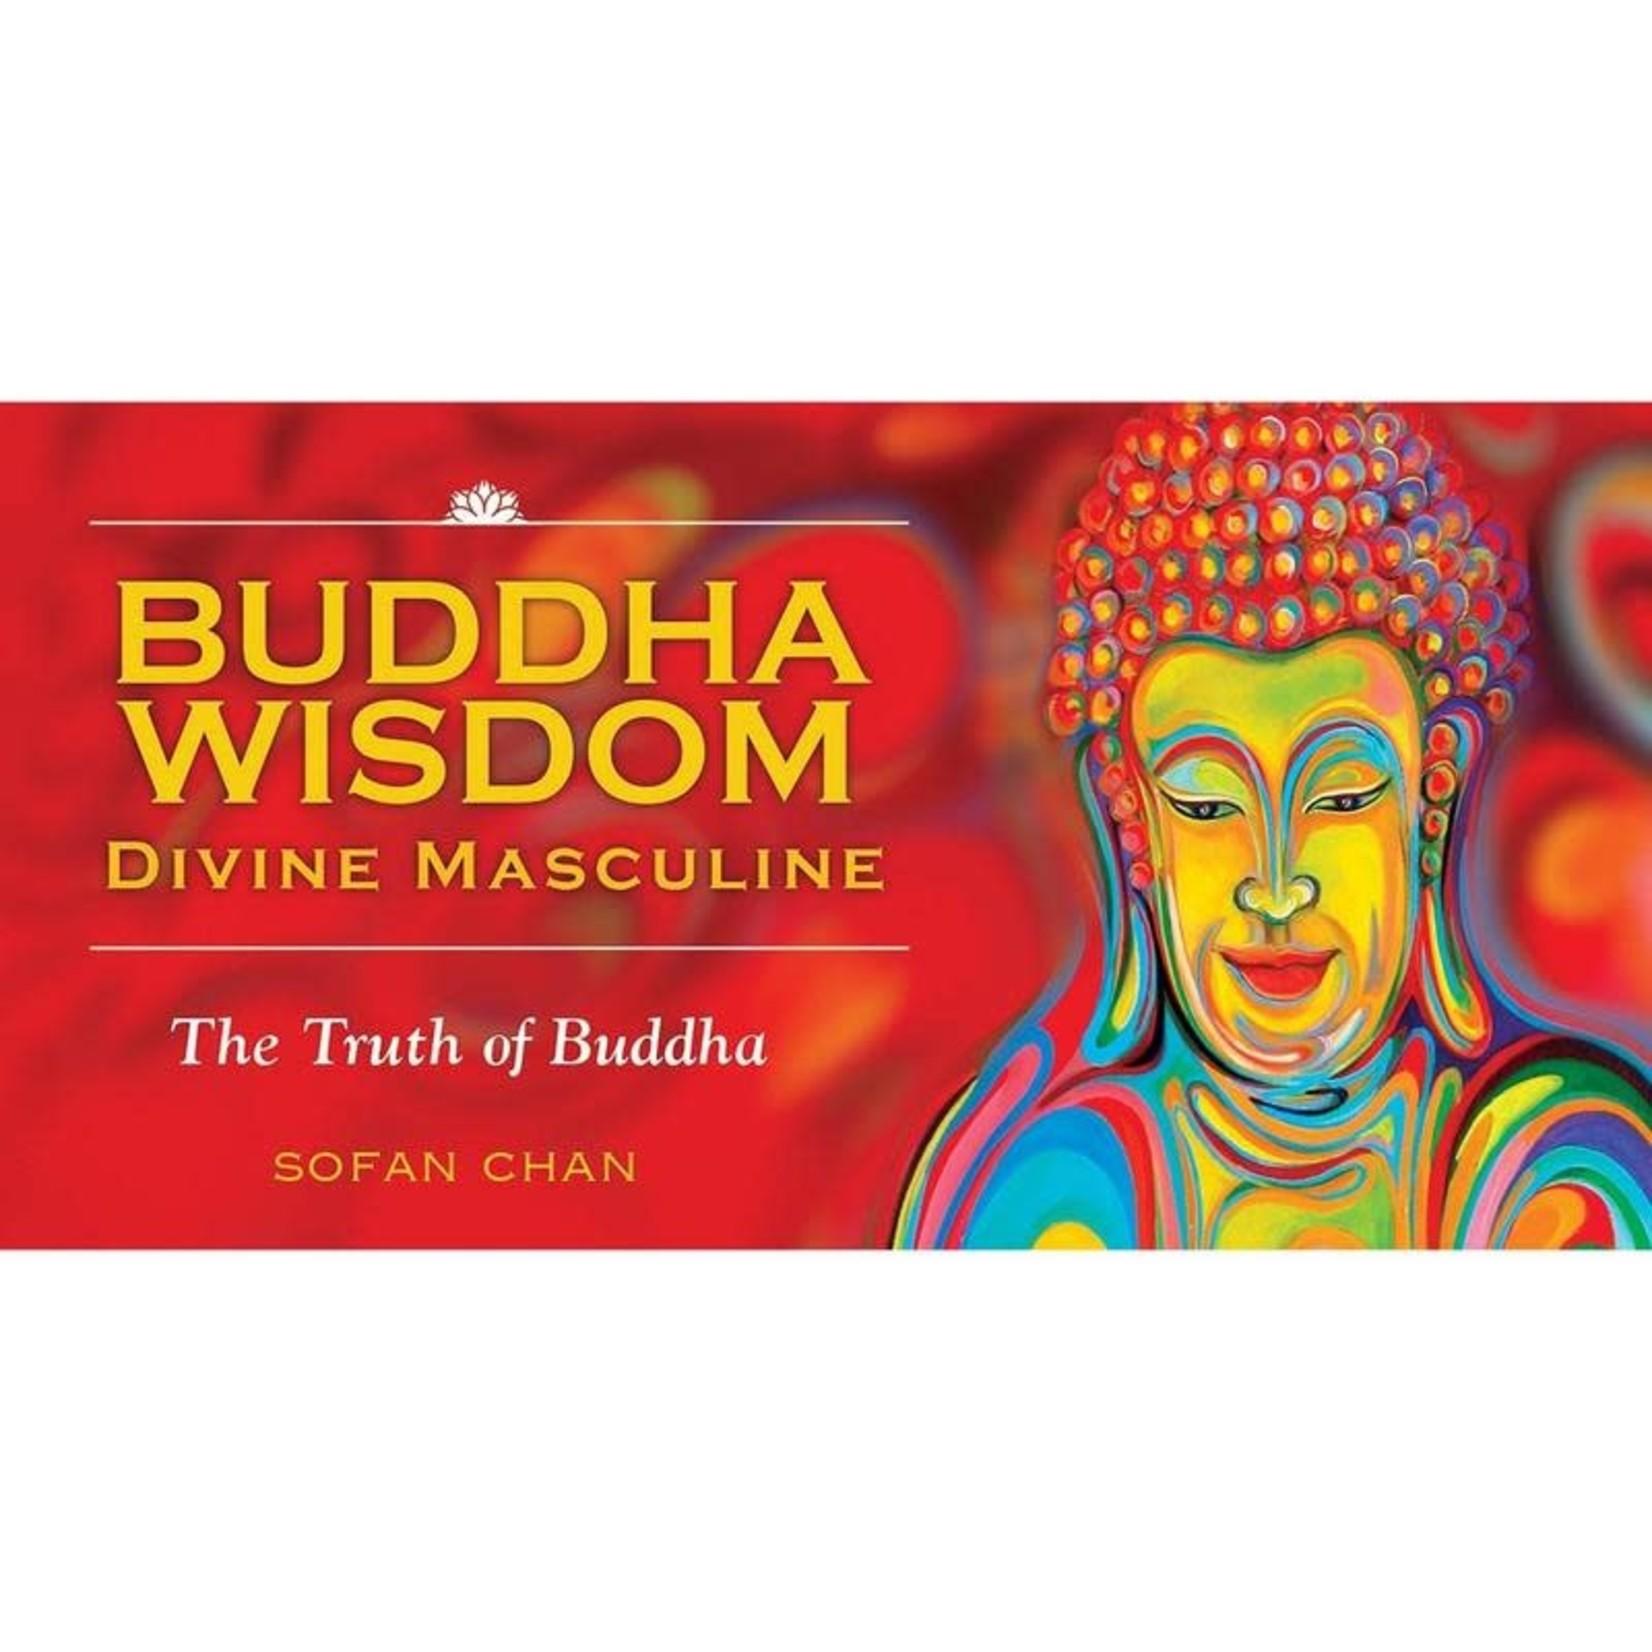 Buddha Wisdom Masculine